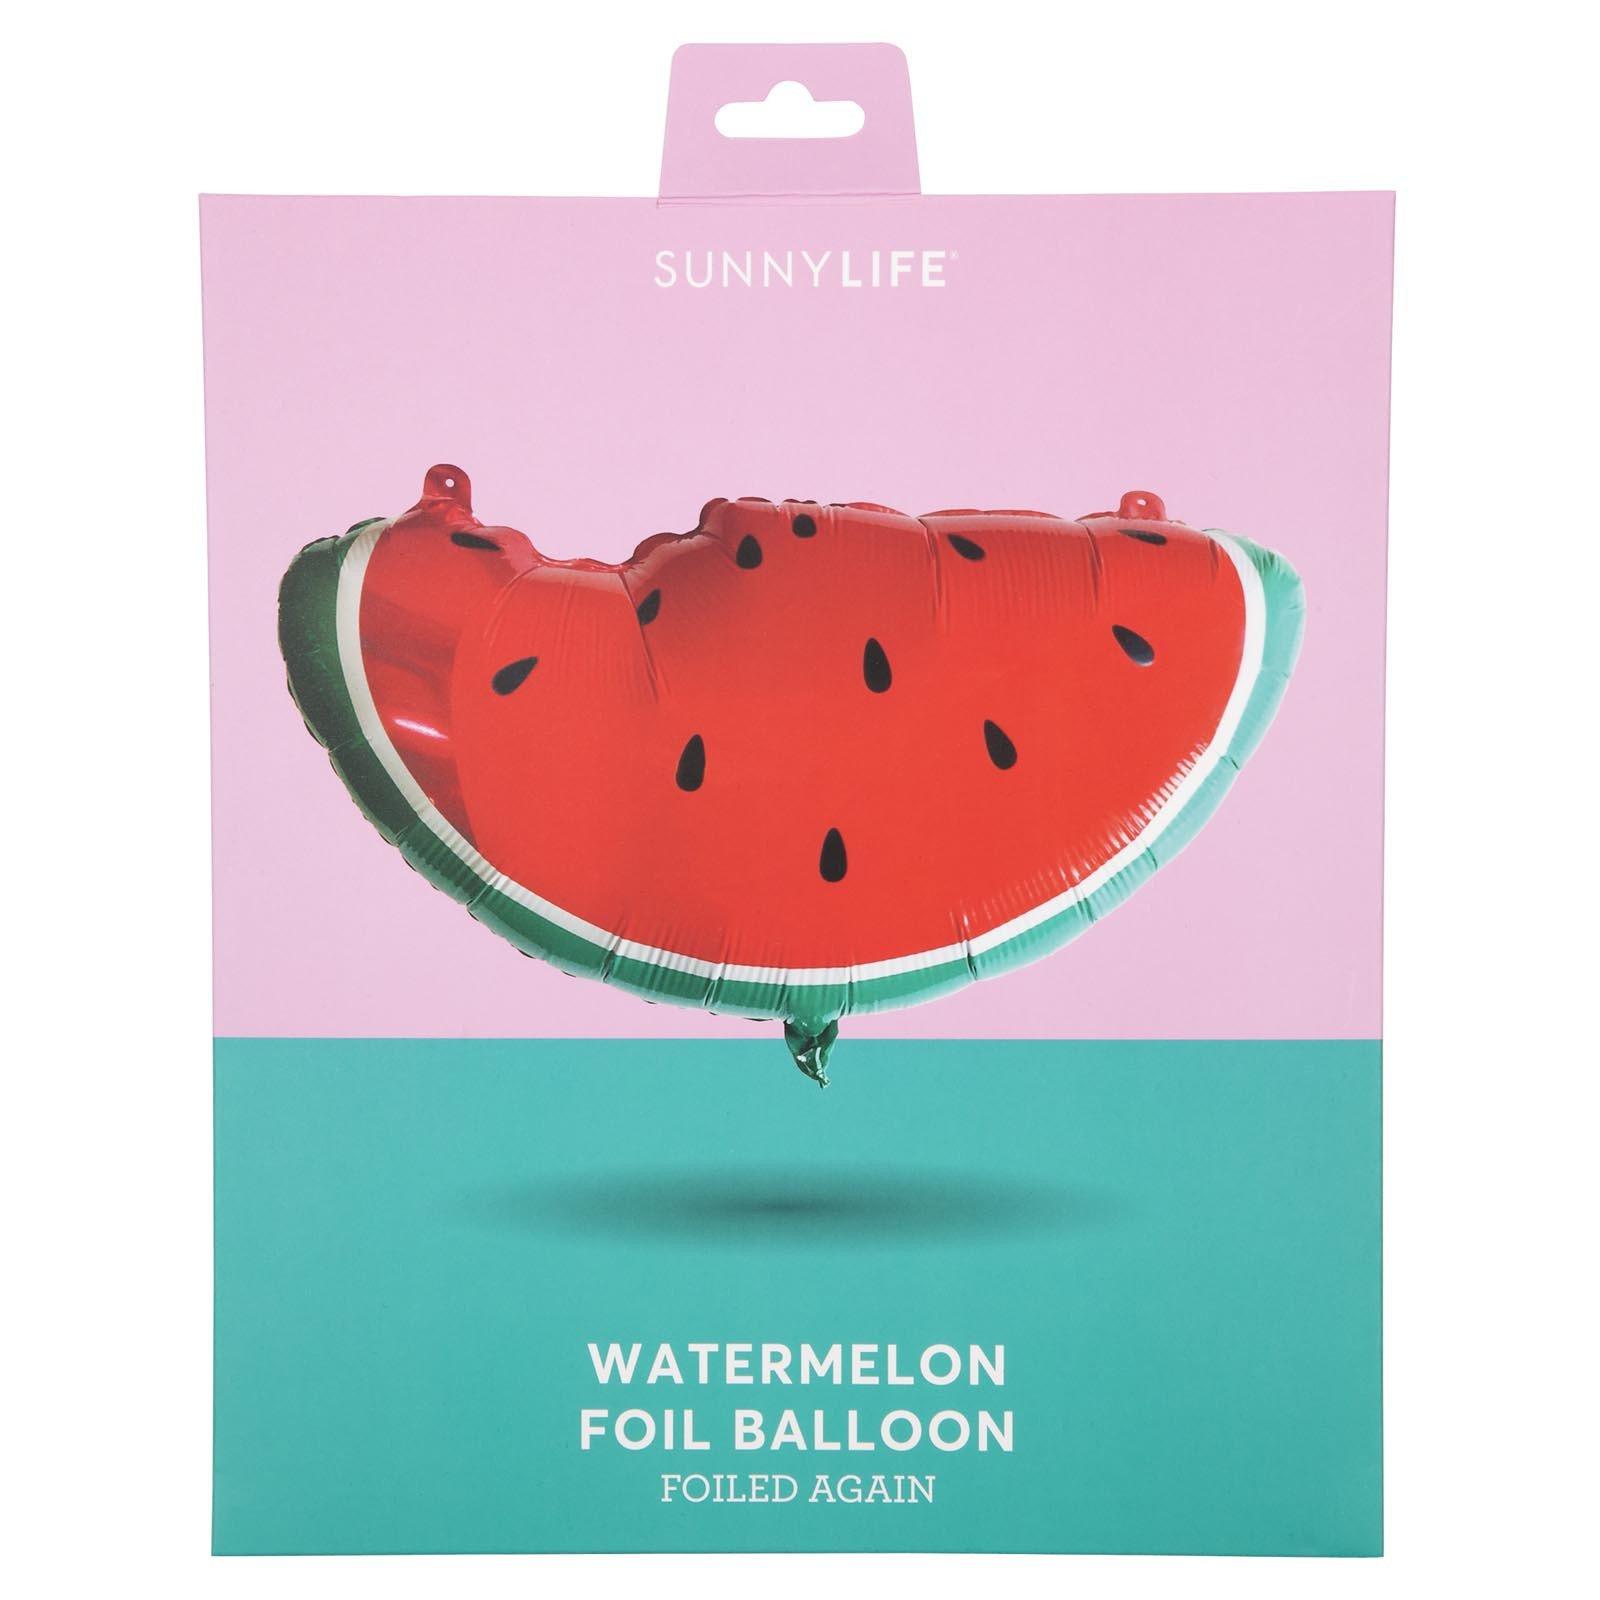 Globo De Fiesta De Aluminio Con Forma De Sandía - Balloon Watermelon